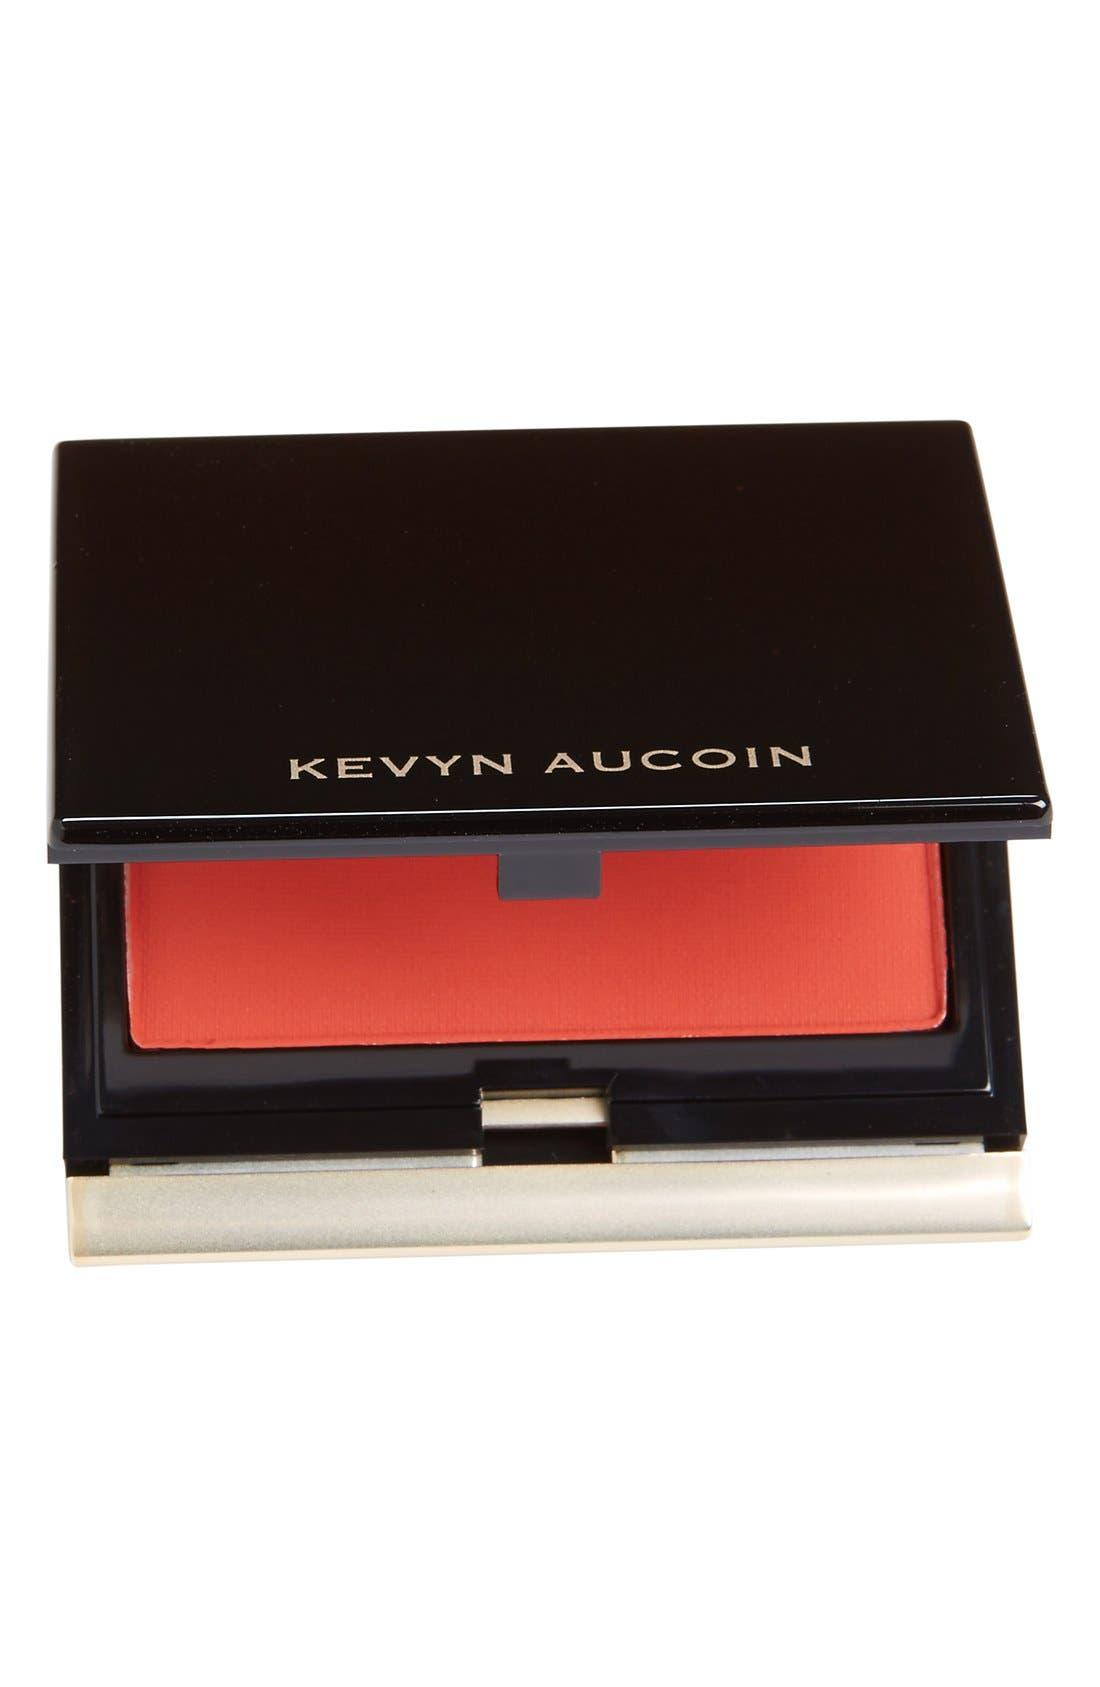 KEVYN AUCOIN BEAUTY,                             SPACE.NK.apothecary Kevyn Aucoin Beauty Pure Powder Glow,                             Main thumbnail 1, color,                             250